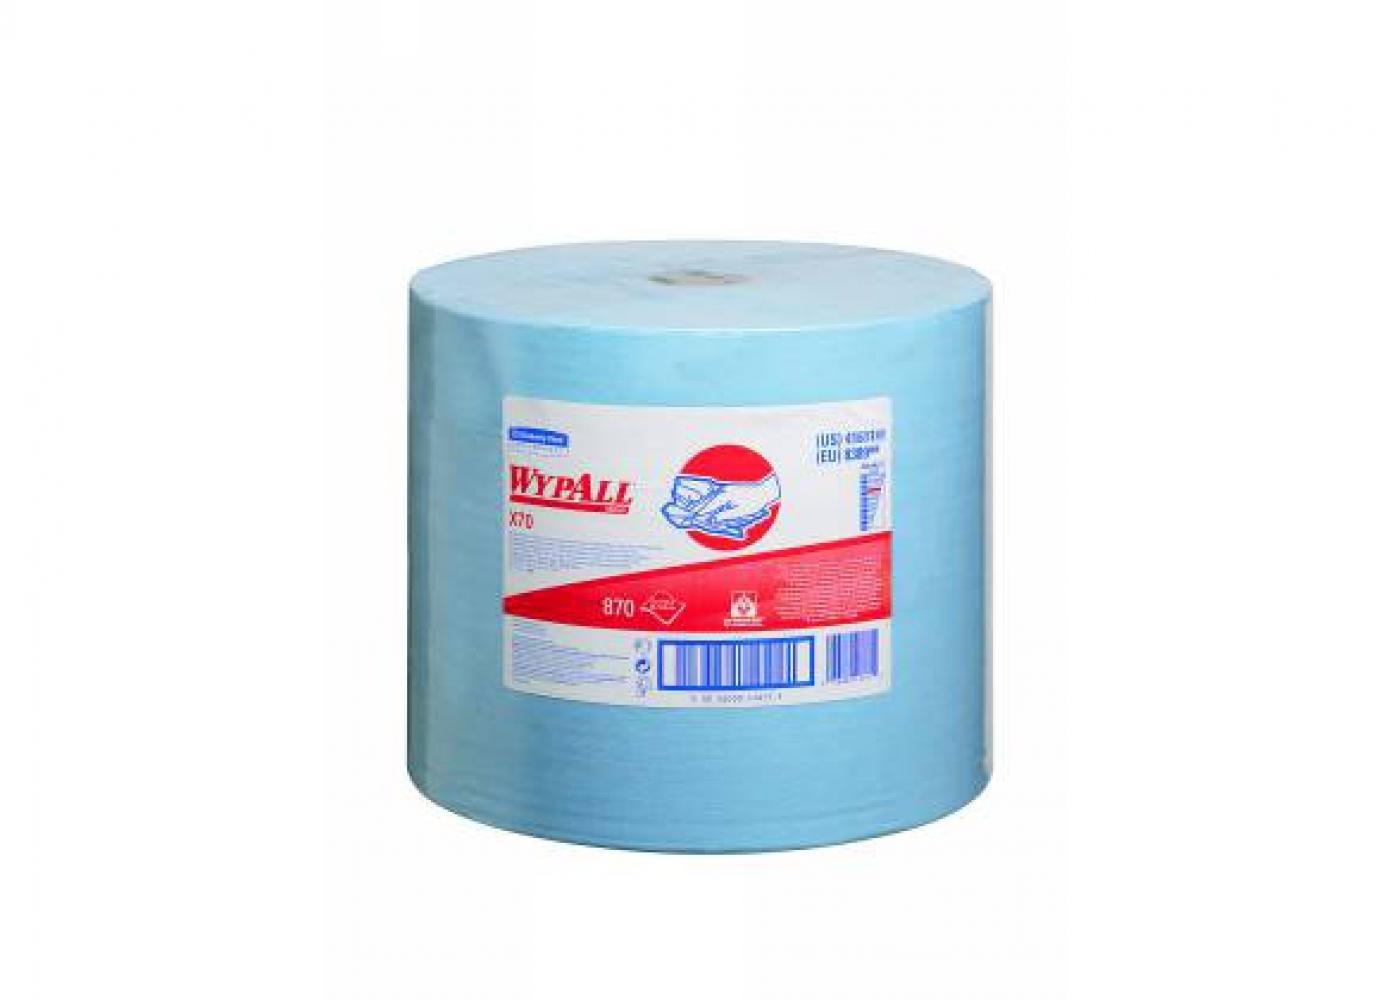 Acquista Wypall X70 Bobina Blu Liscia 34x31 17545632 | Glooke.com